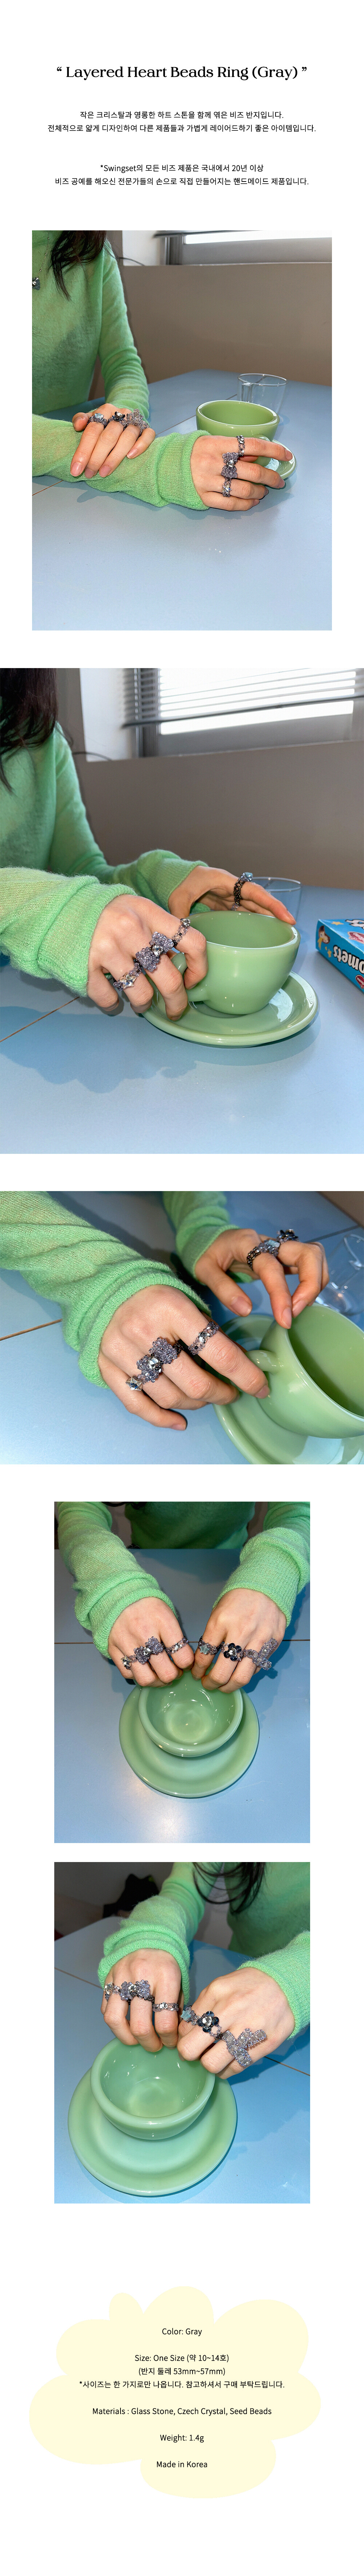 Layered Heart Beads Ring (Gray)